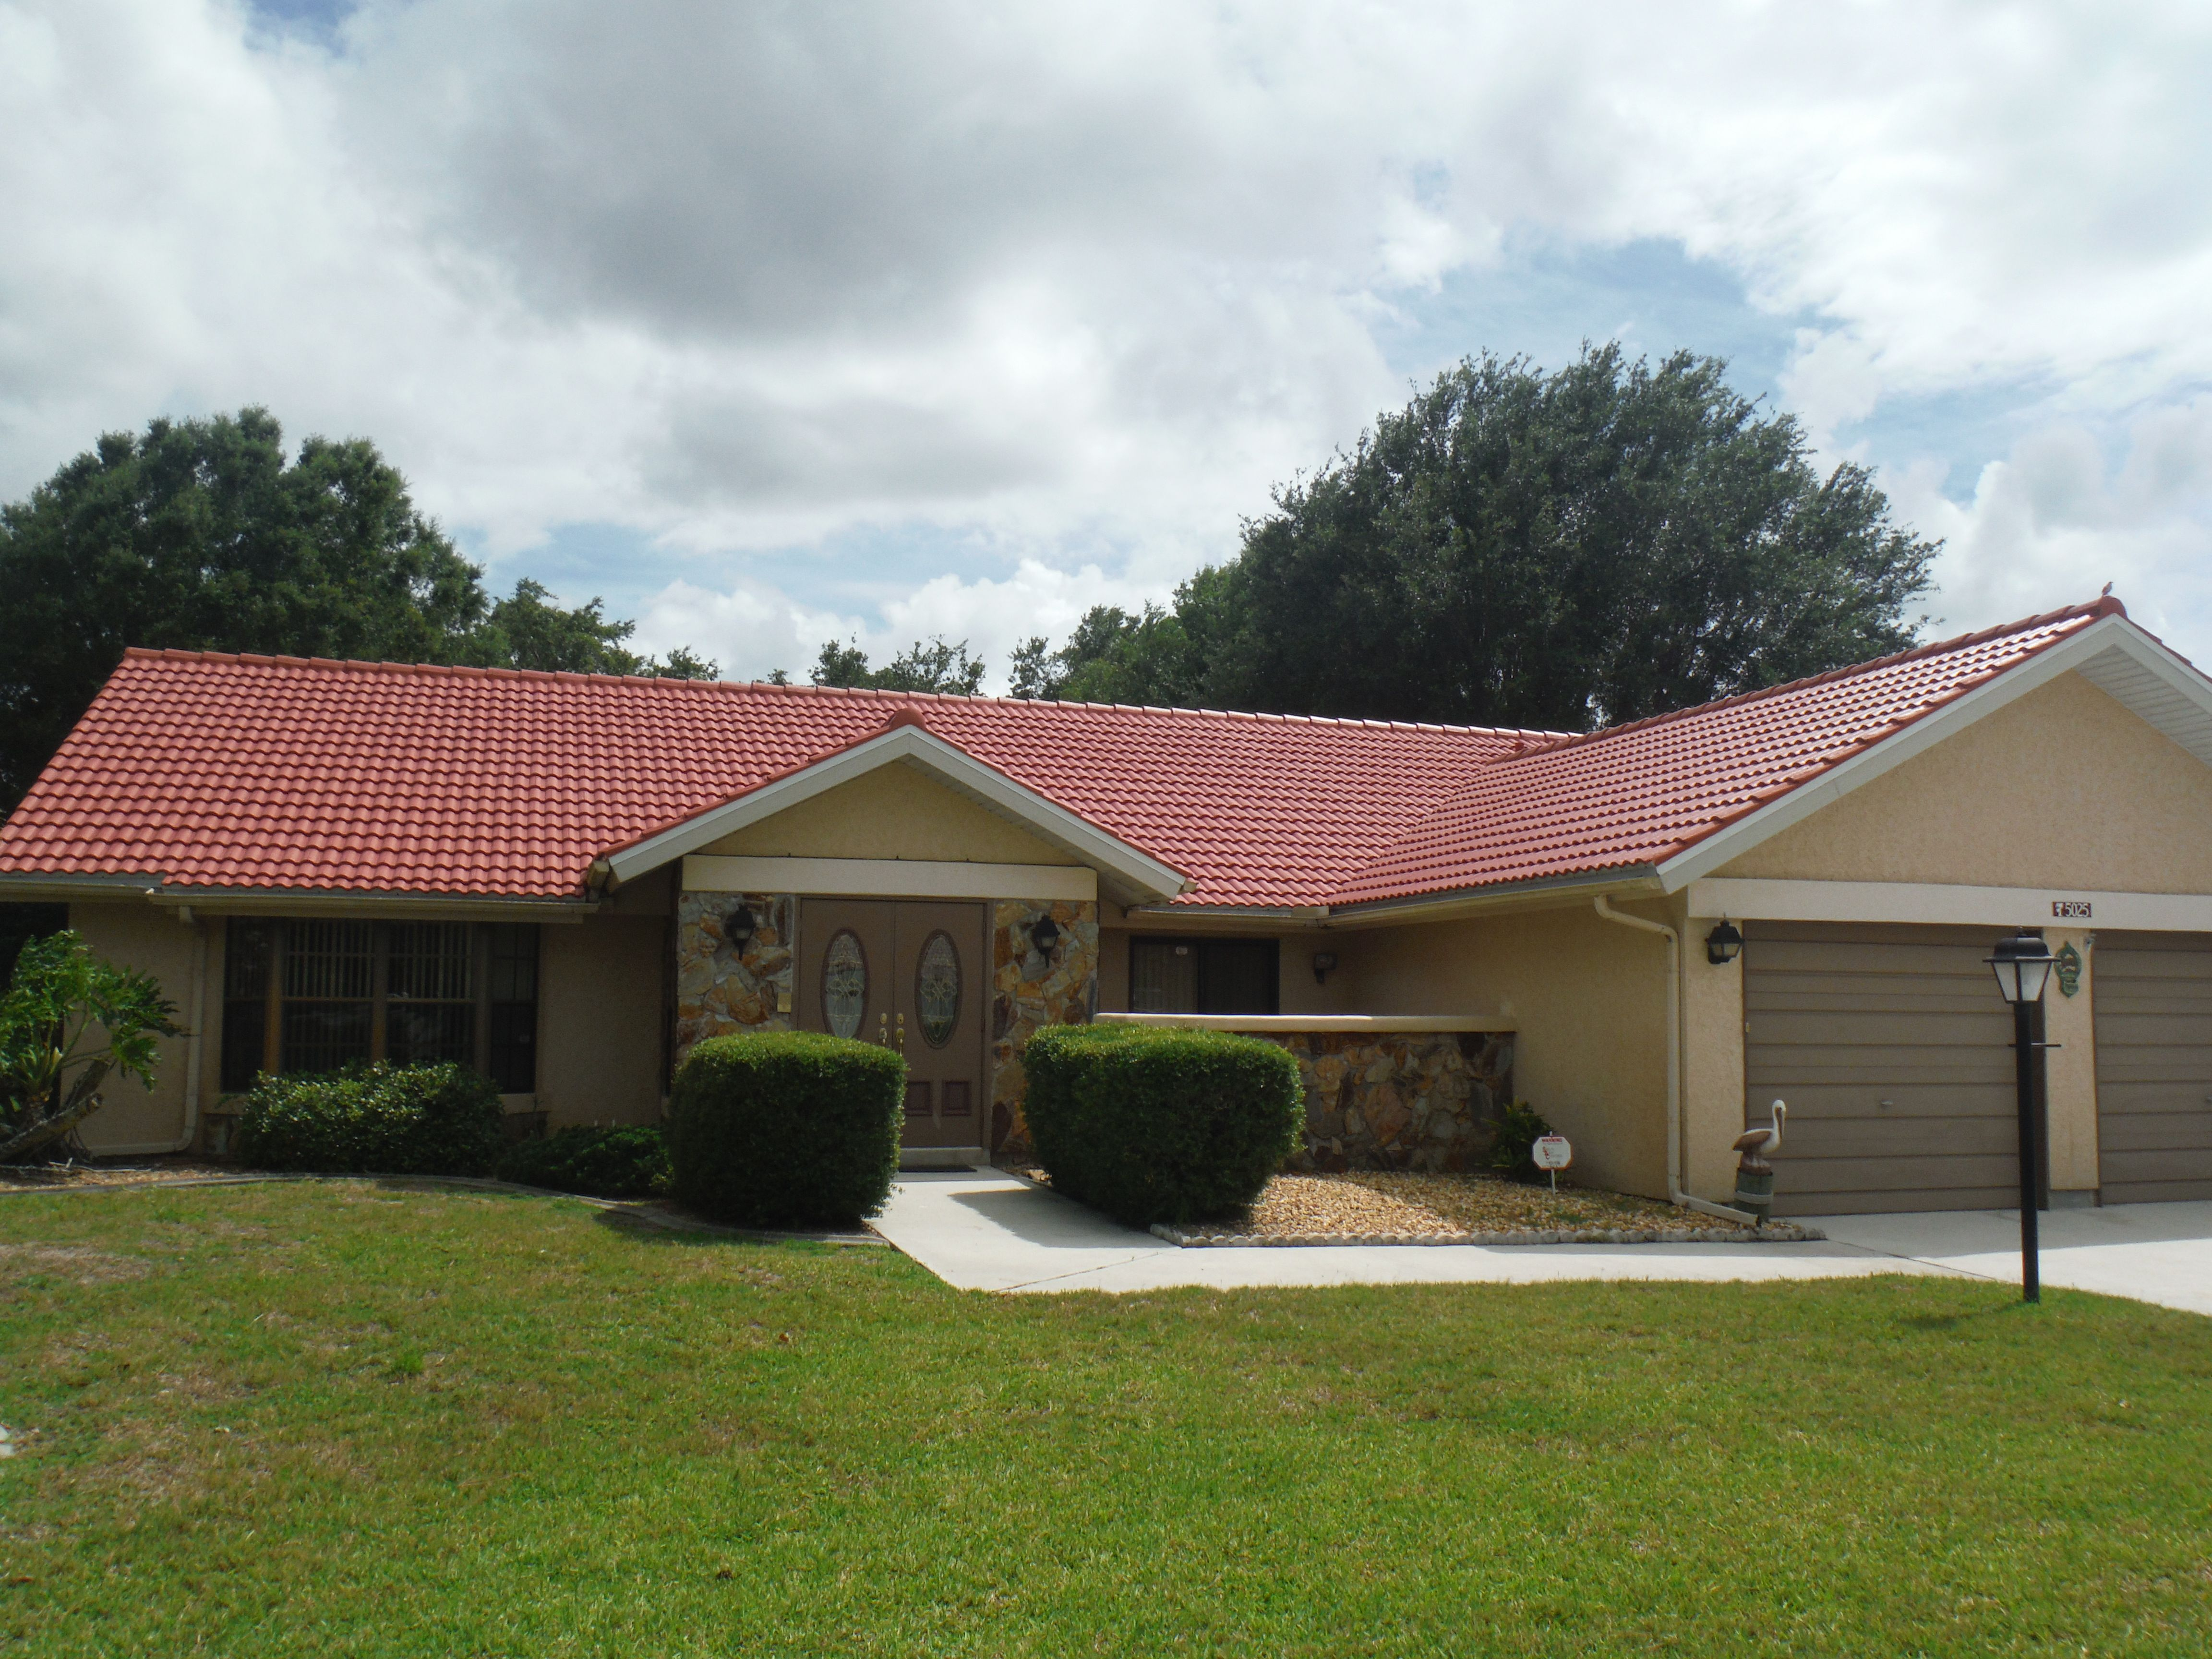 Mark Kaufman Roofing Reroof Eagle Malibu Tile Color Cayenne